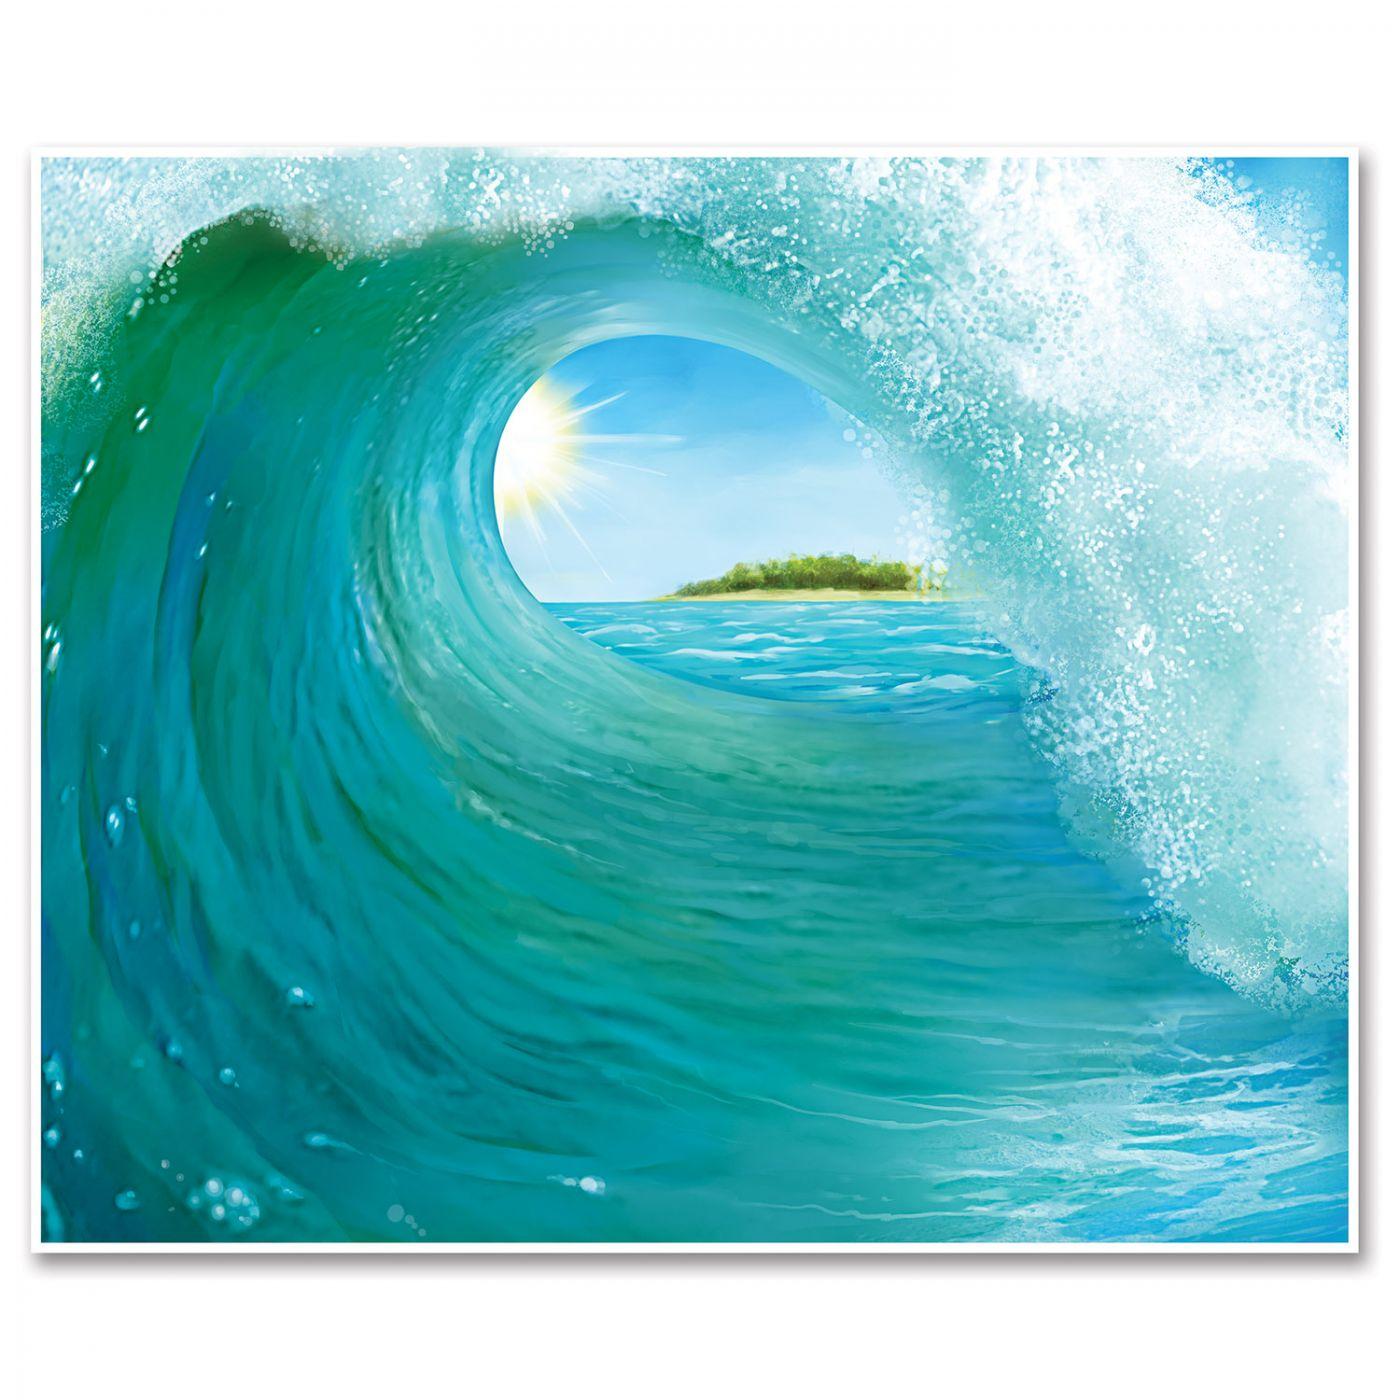 Surf Wave Insta-Mural (6) image